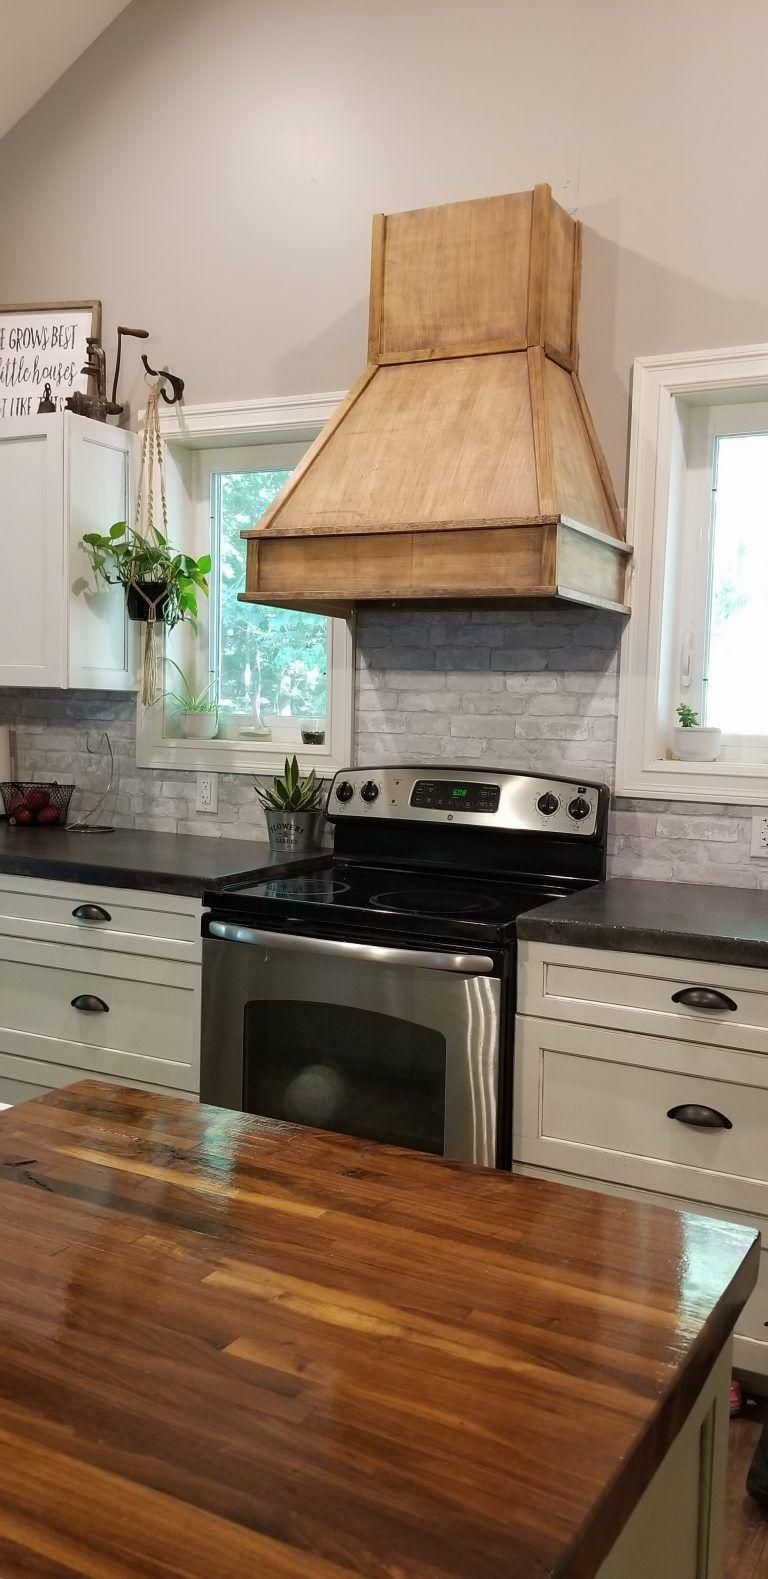 Diy Rustic Range Hood The Homemade Abode Tuscan Kitchen Kitchen Island Countertop White Kitchen Remodeling